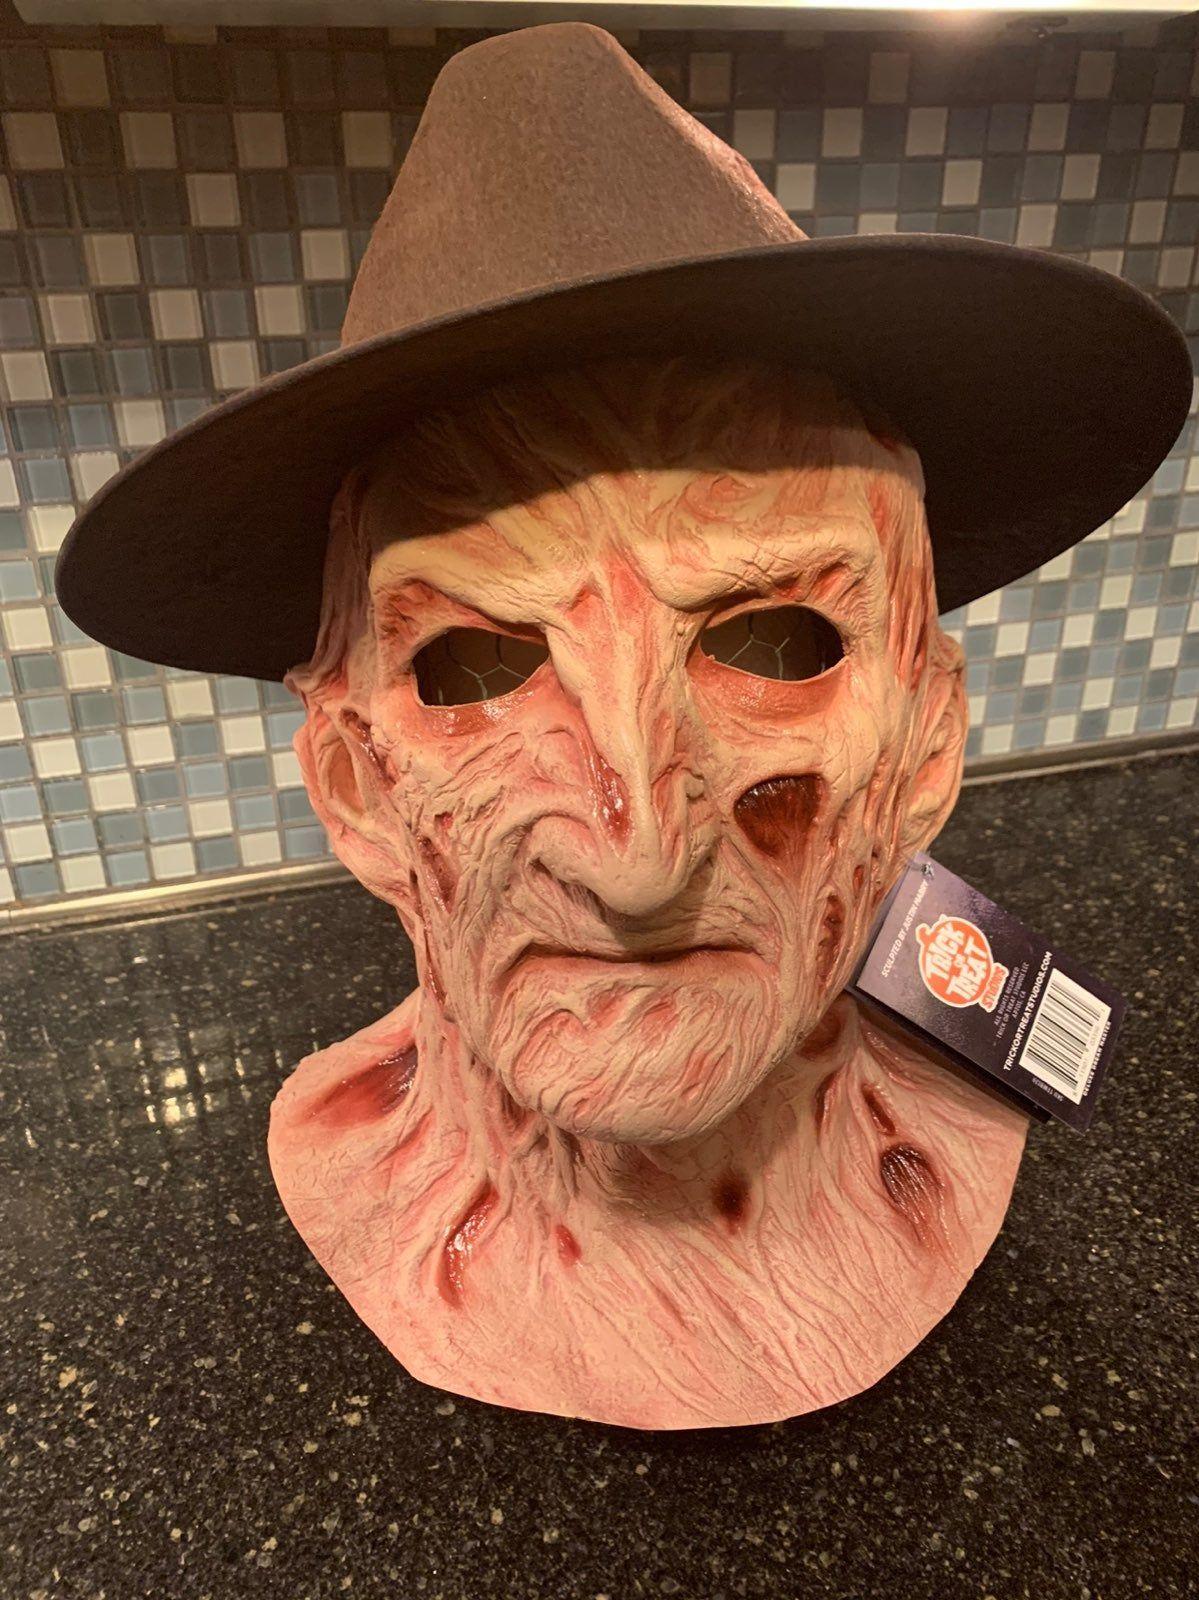 Deluxe Freddy Kruegar Mask With Fedora Mercari Trick Or Treat Studios Halloween Masks Freddy Krueger